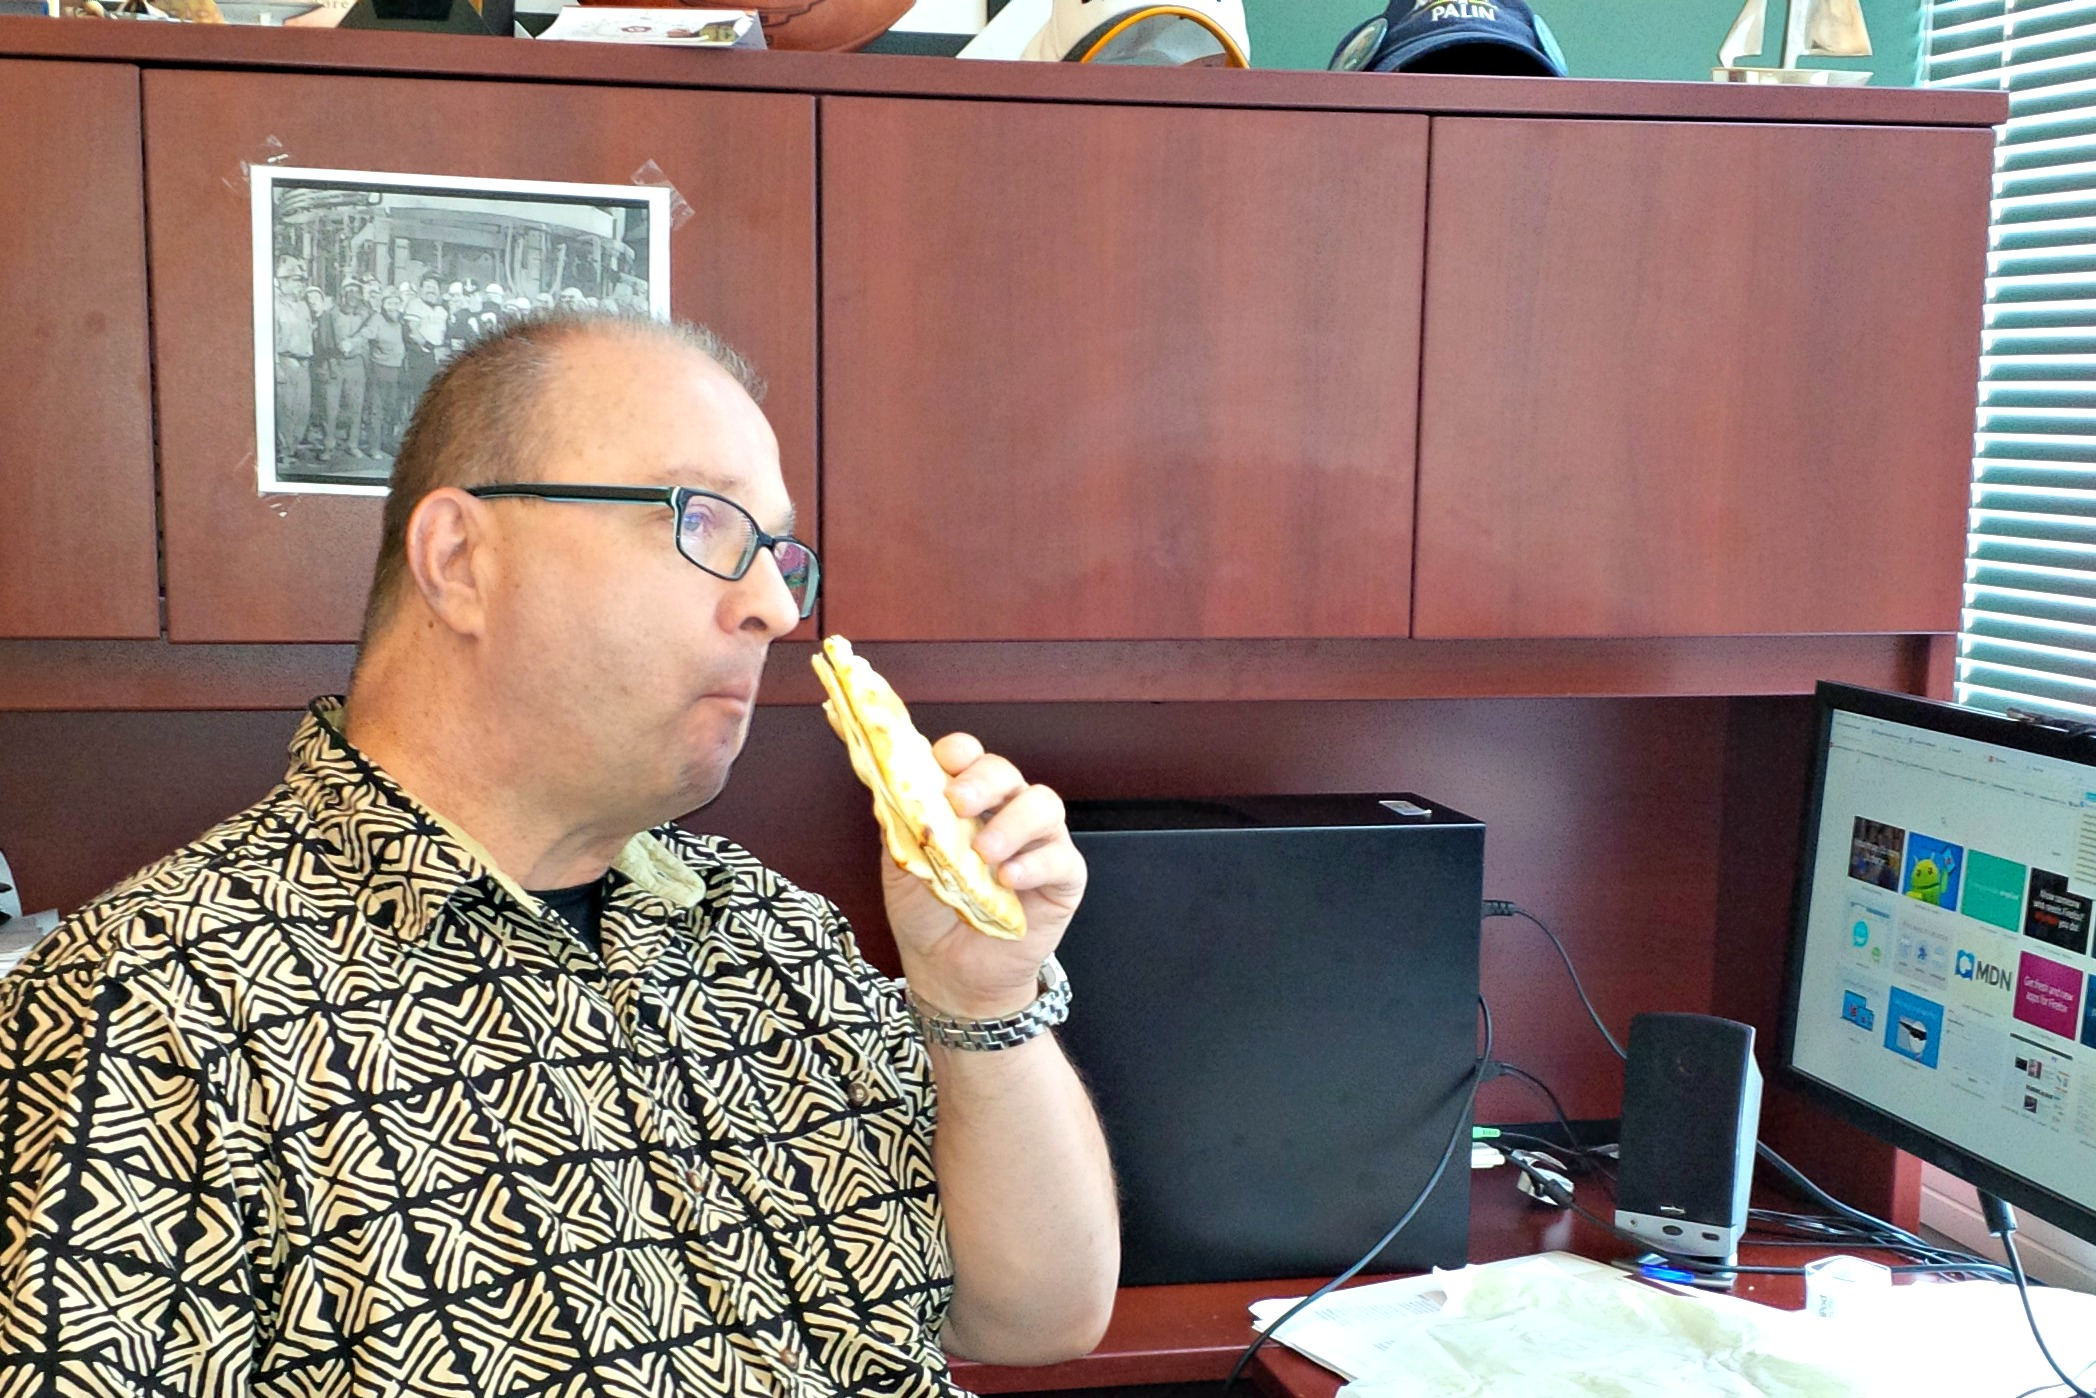 Jerry Eddy Eating a Sandwich